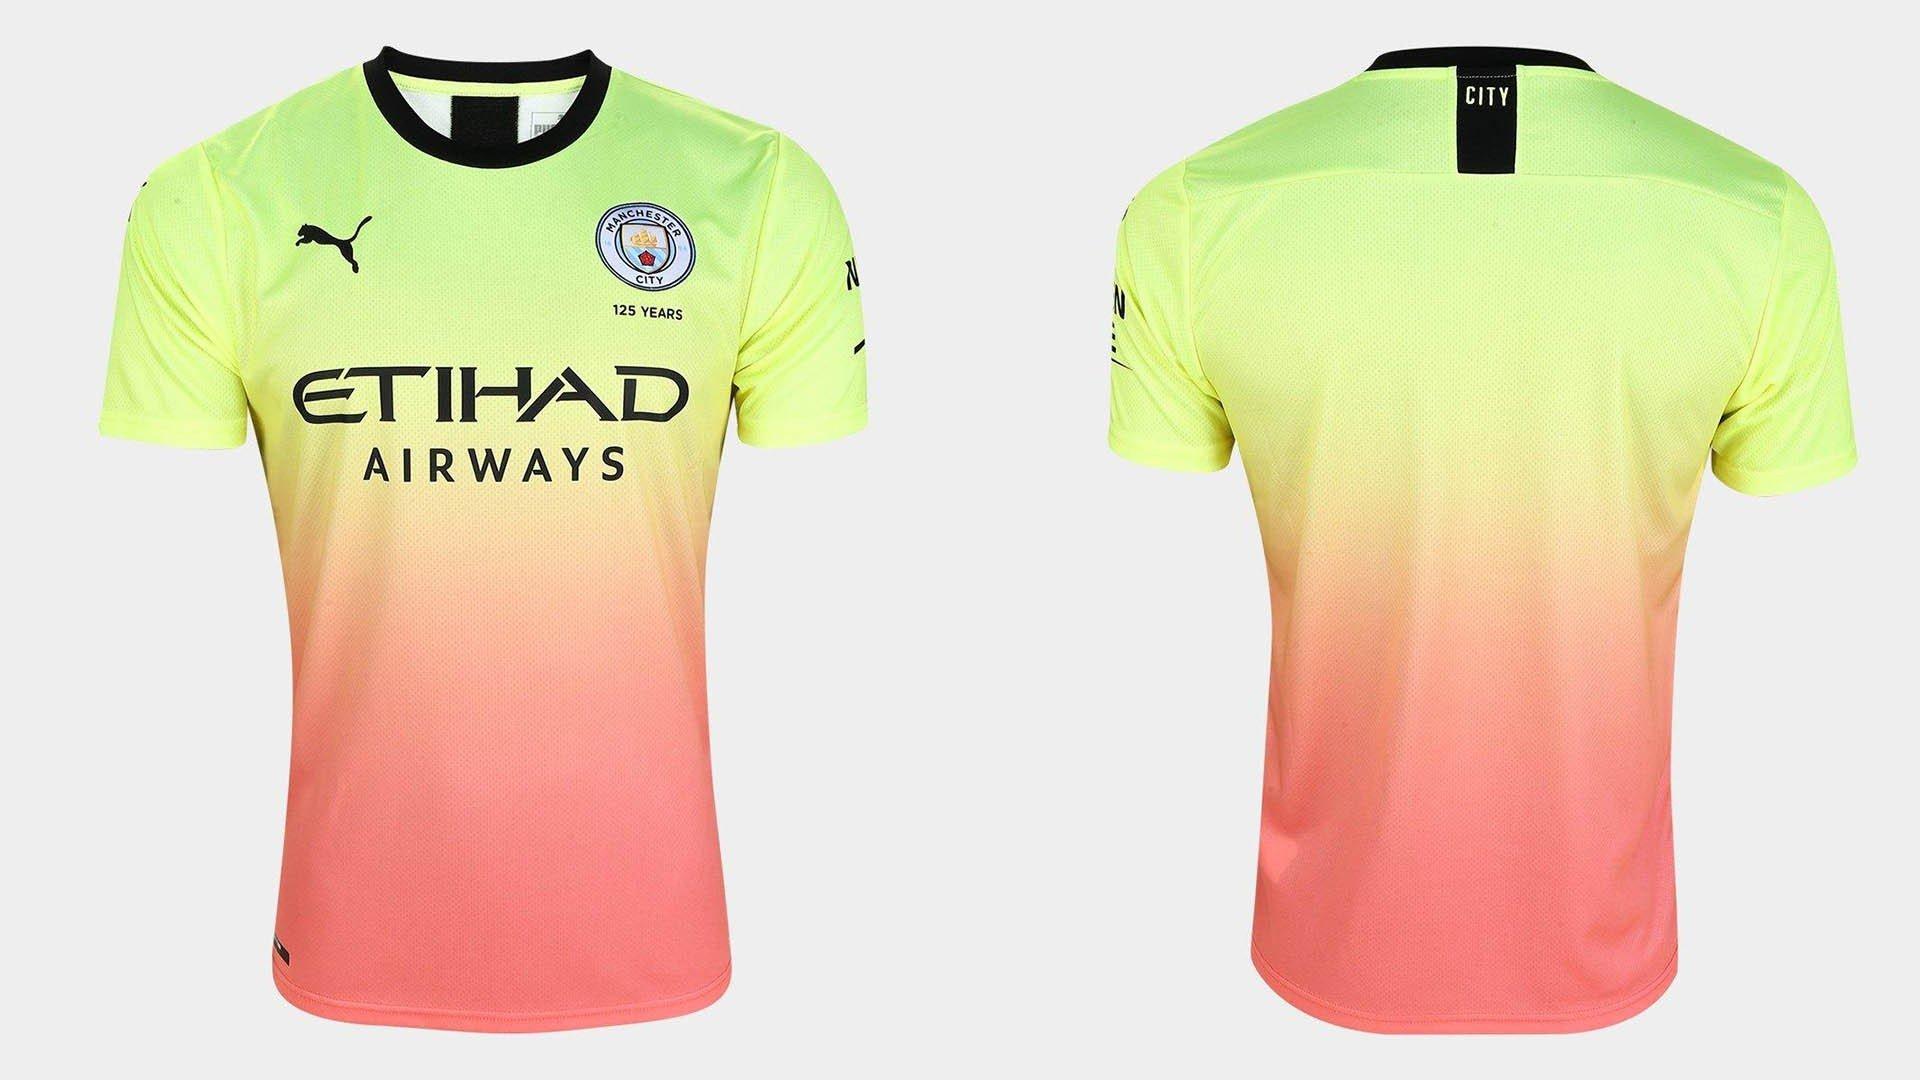 terceiro uniforme manchester city 2019 20